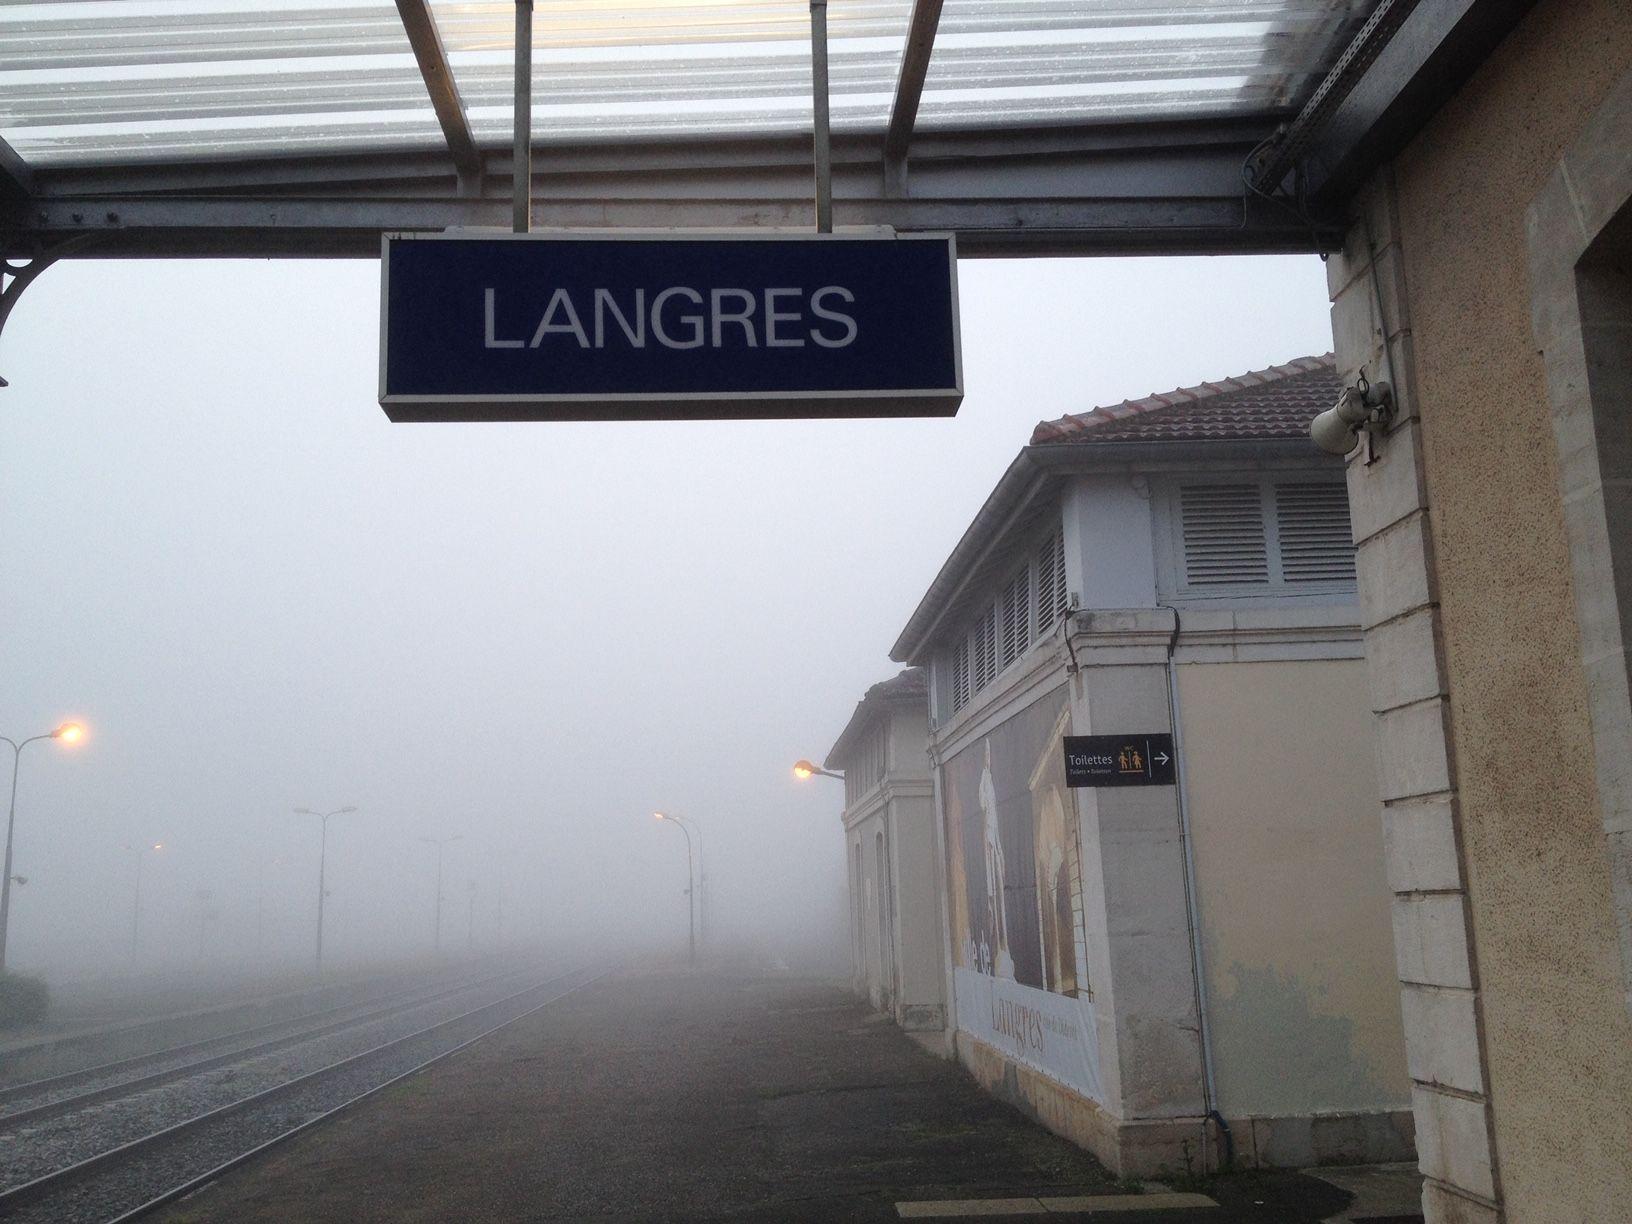 Denis Diderot's France 3 - LANGRES - Train station sign